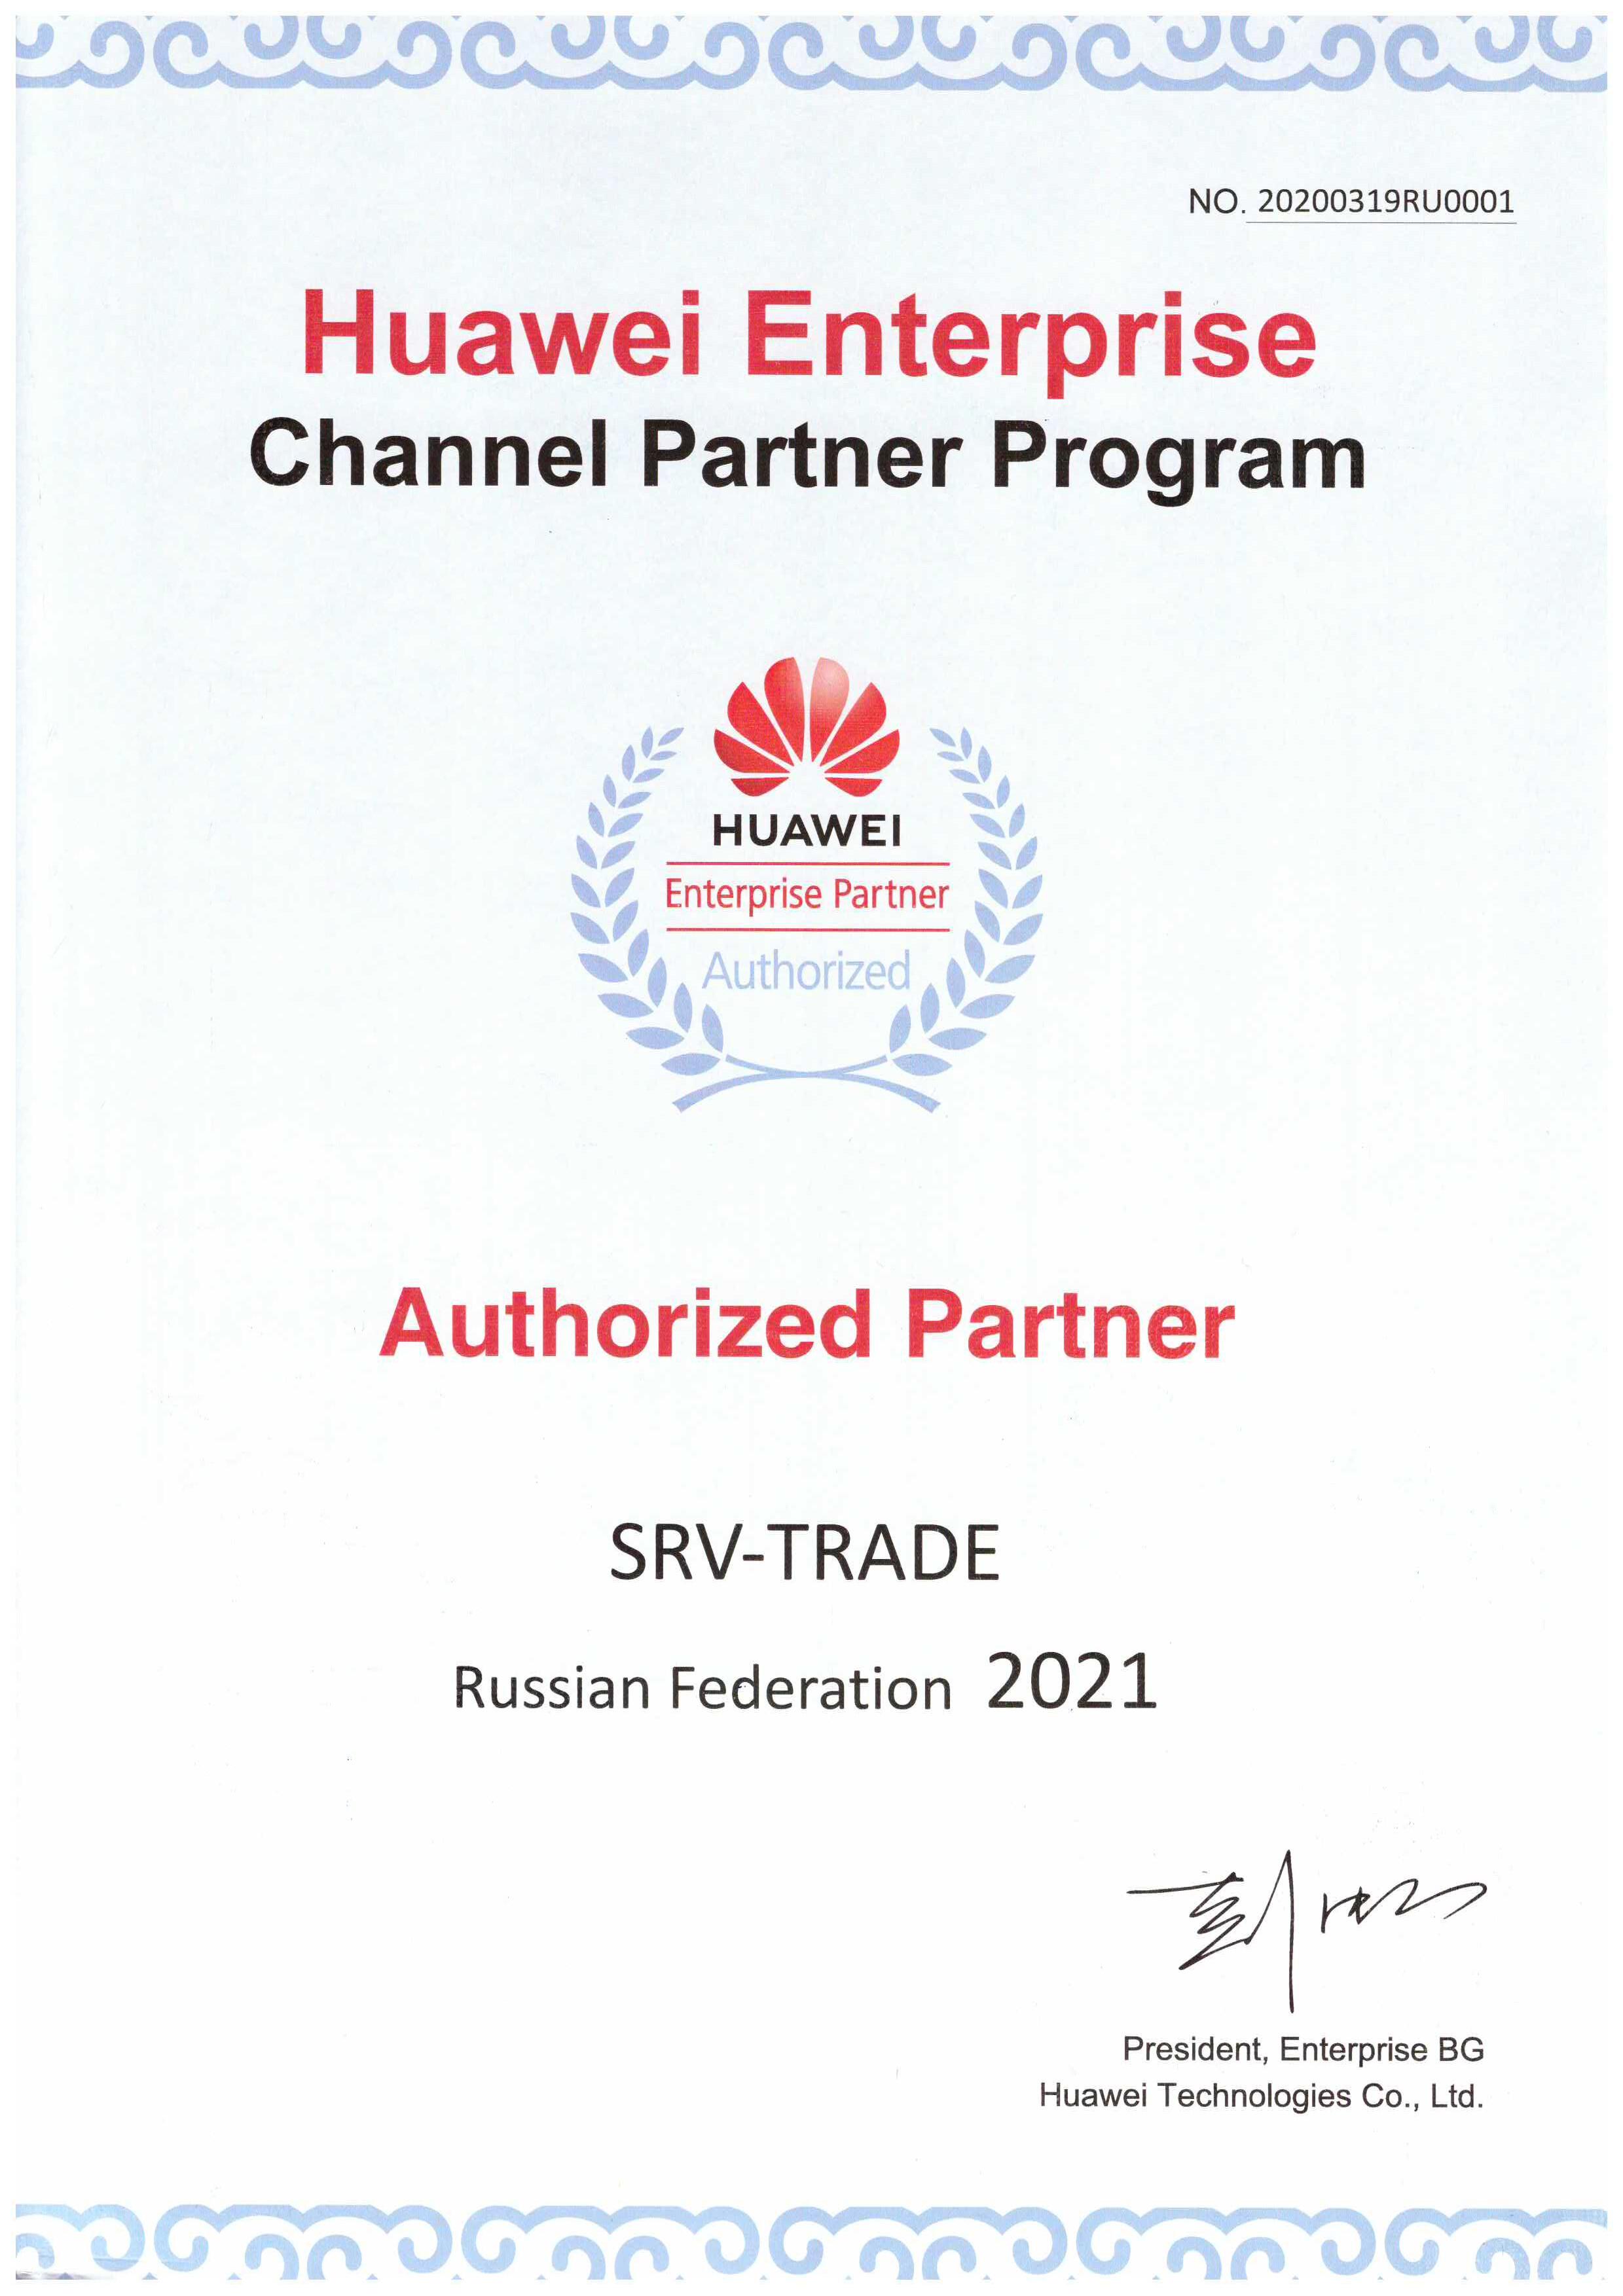 Сертификат SRV-TRADE как партнера Huaweit